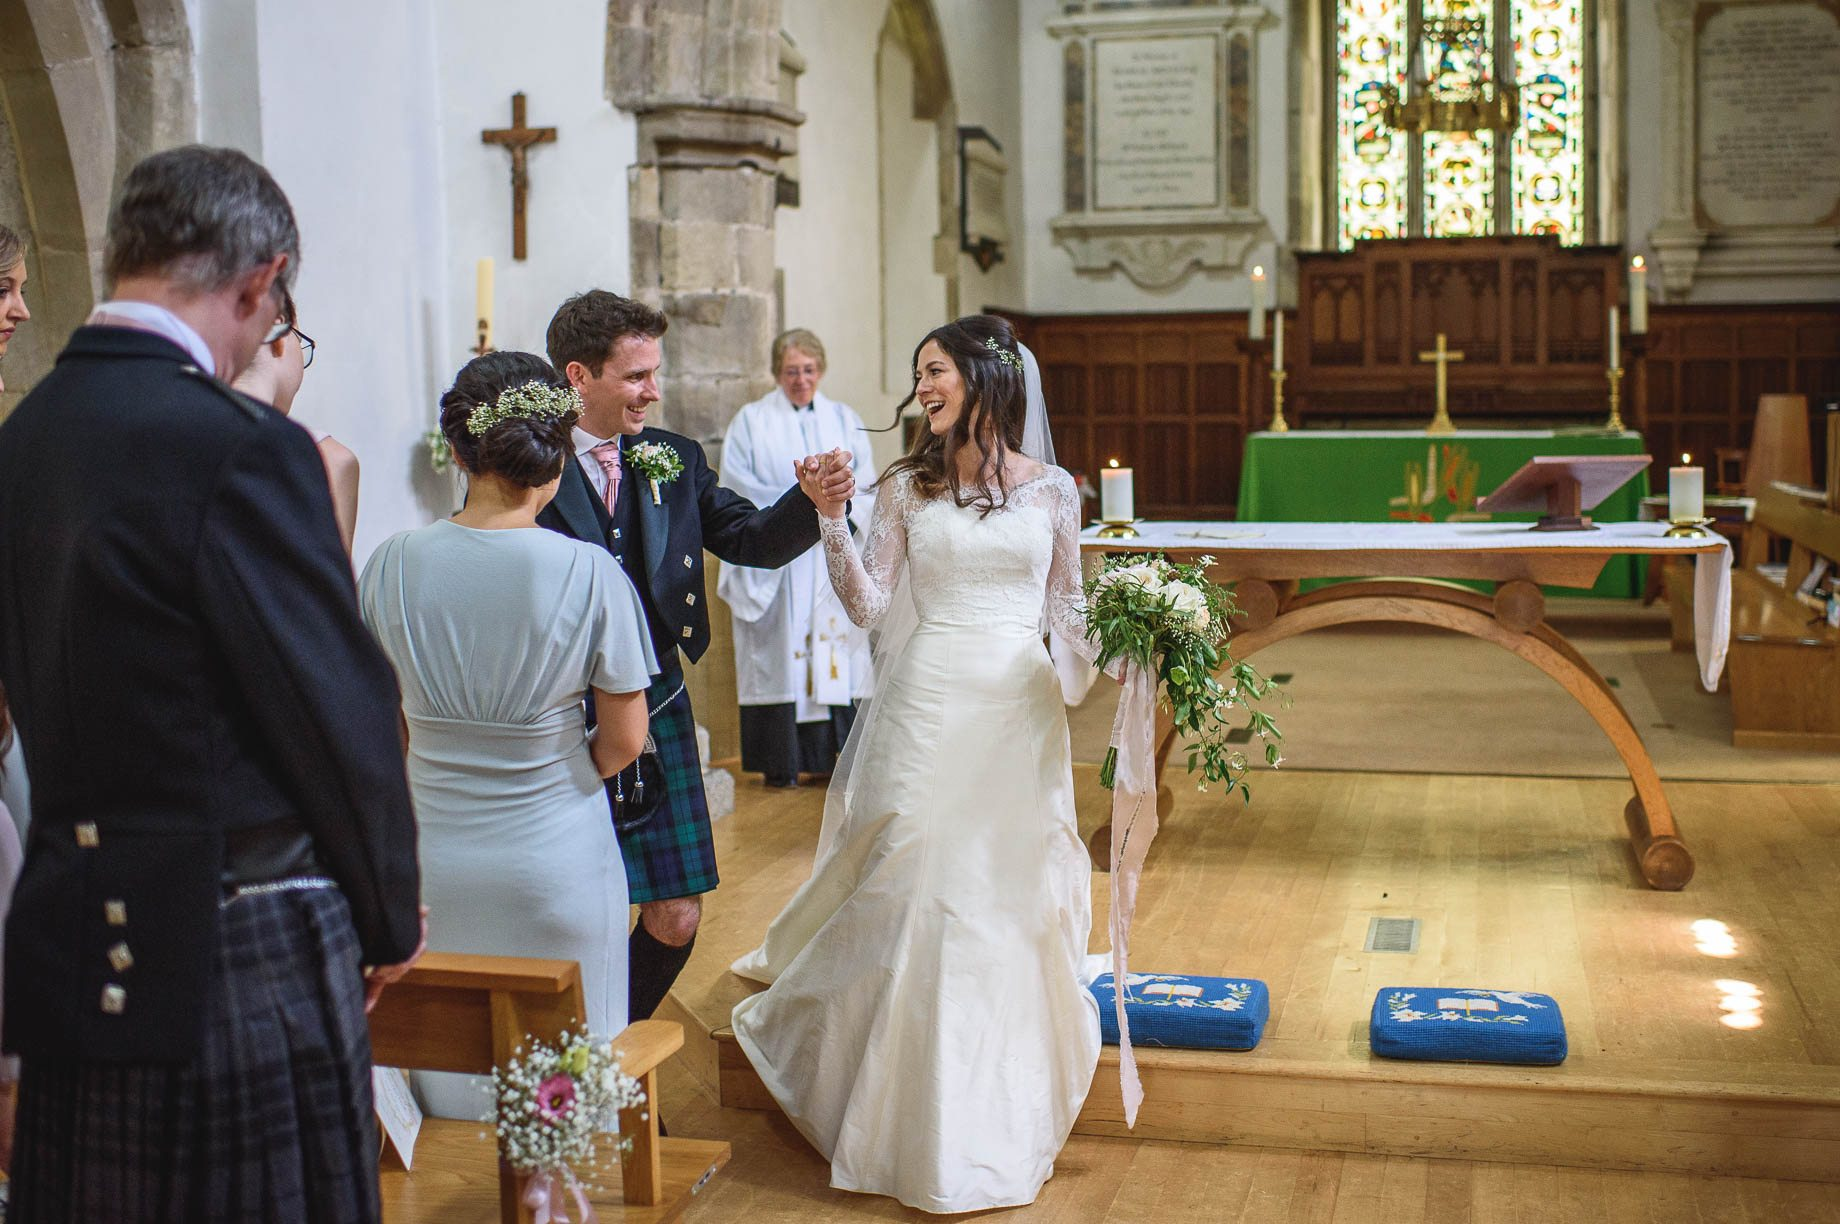 Gildings Barn wedding photography - Sarah and Steve (57 of 190)